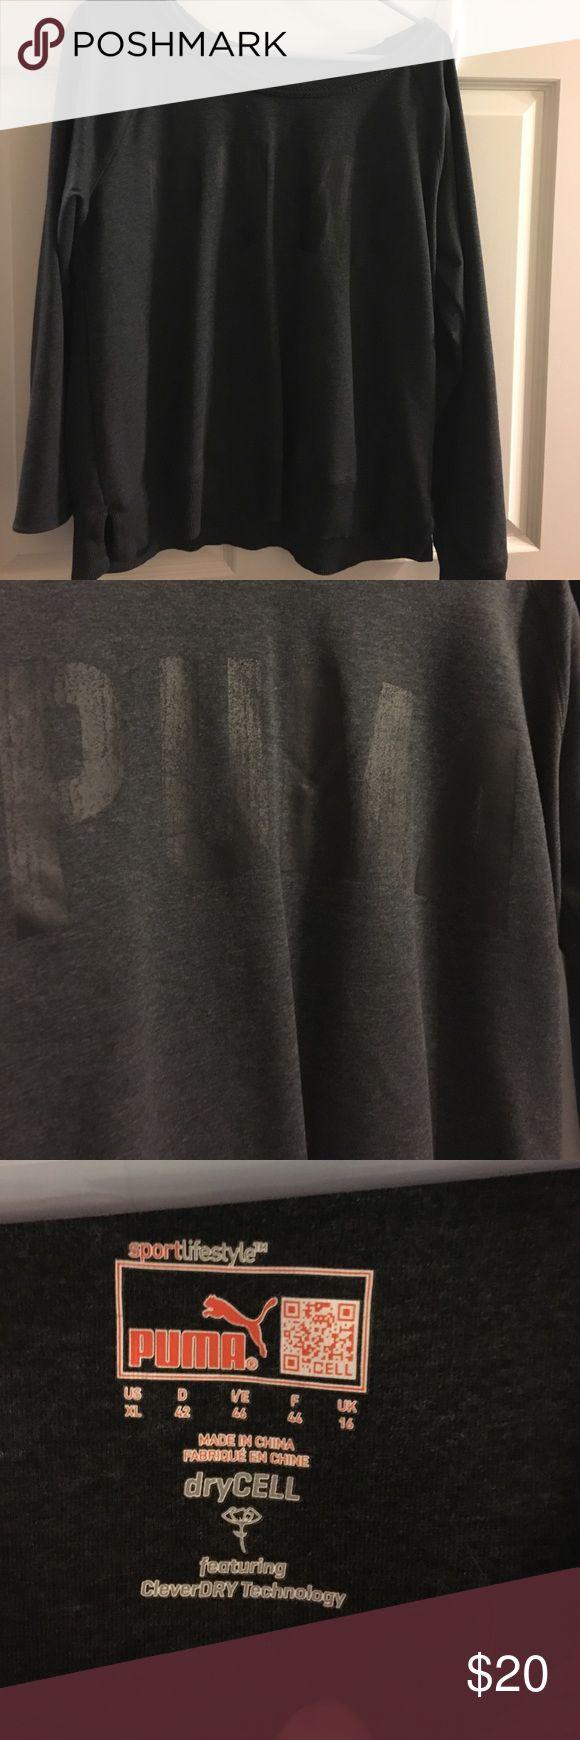 PUMA sweatshirt EUC. Comes from smoke free home. Bundle for discount. Or make an offer. Puma Tops Sweatshirts & Hoodies